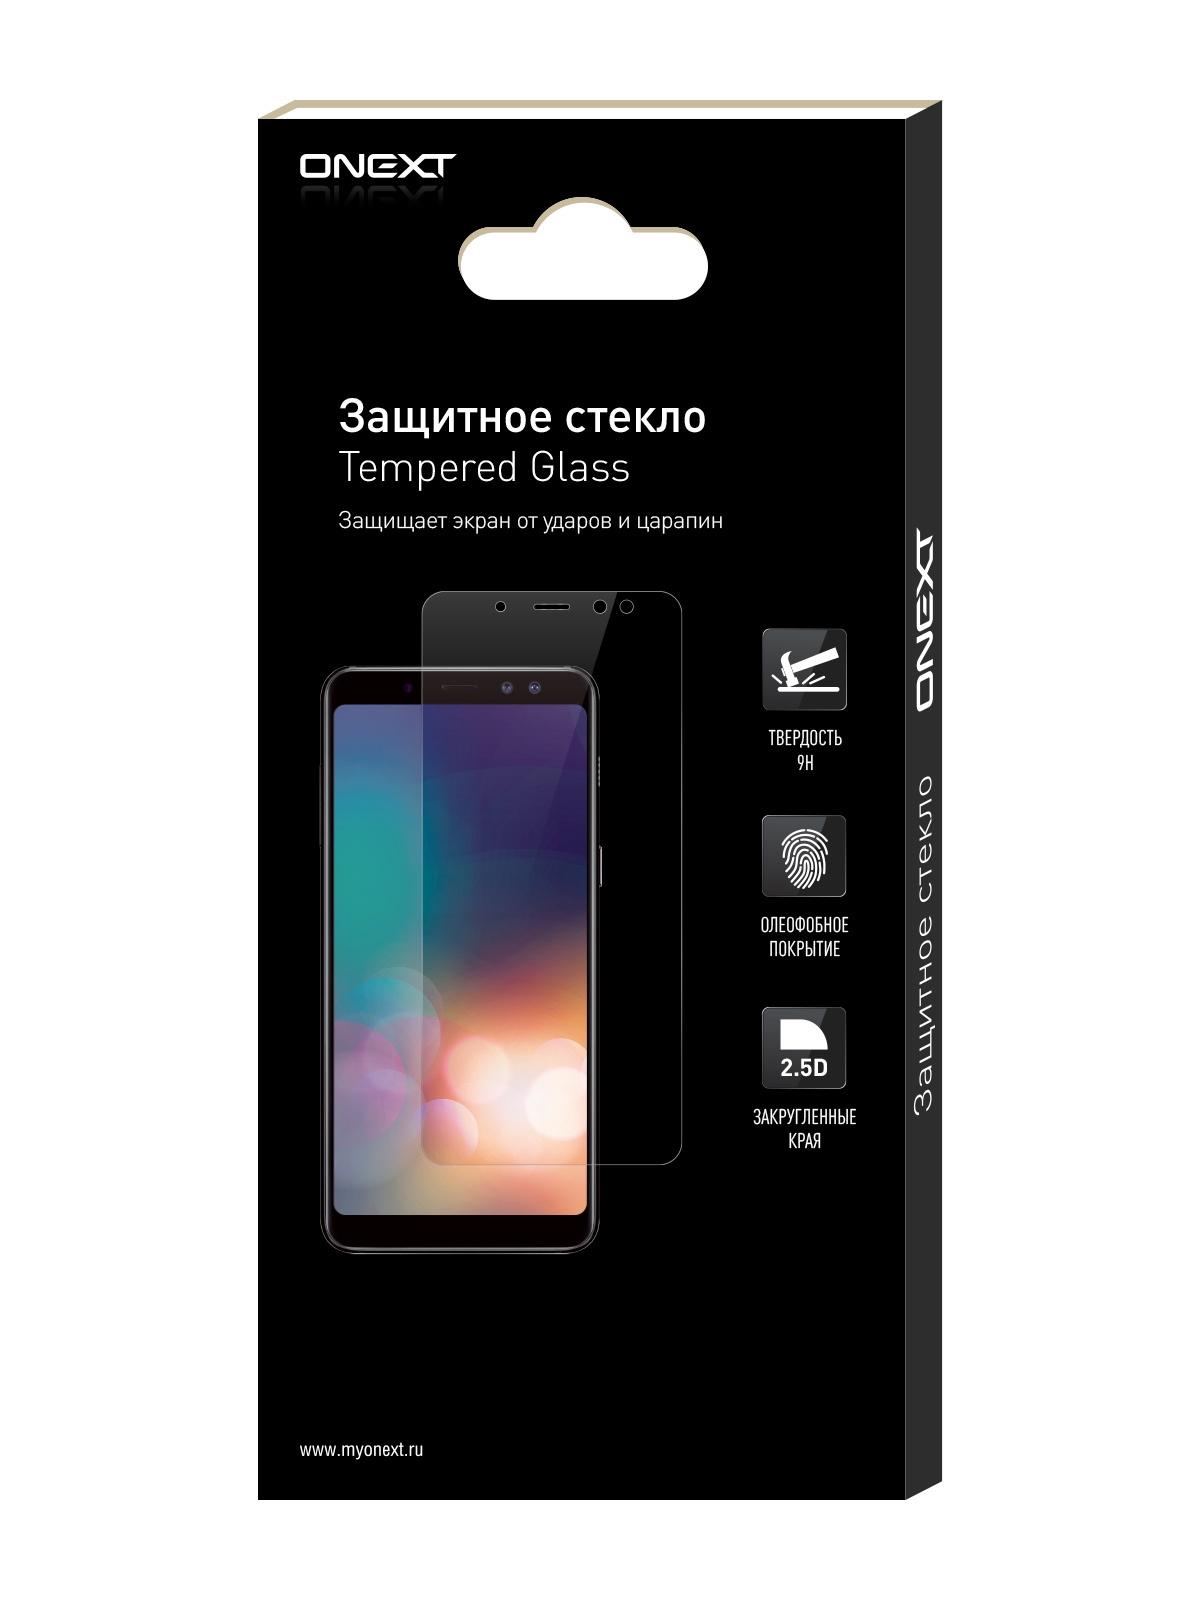 Защитное стекло ONEXT LG Nexus 5X